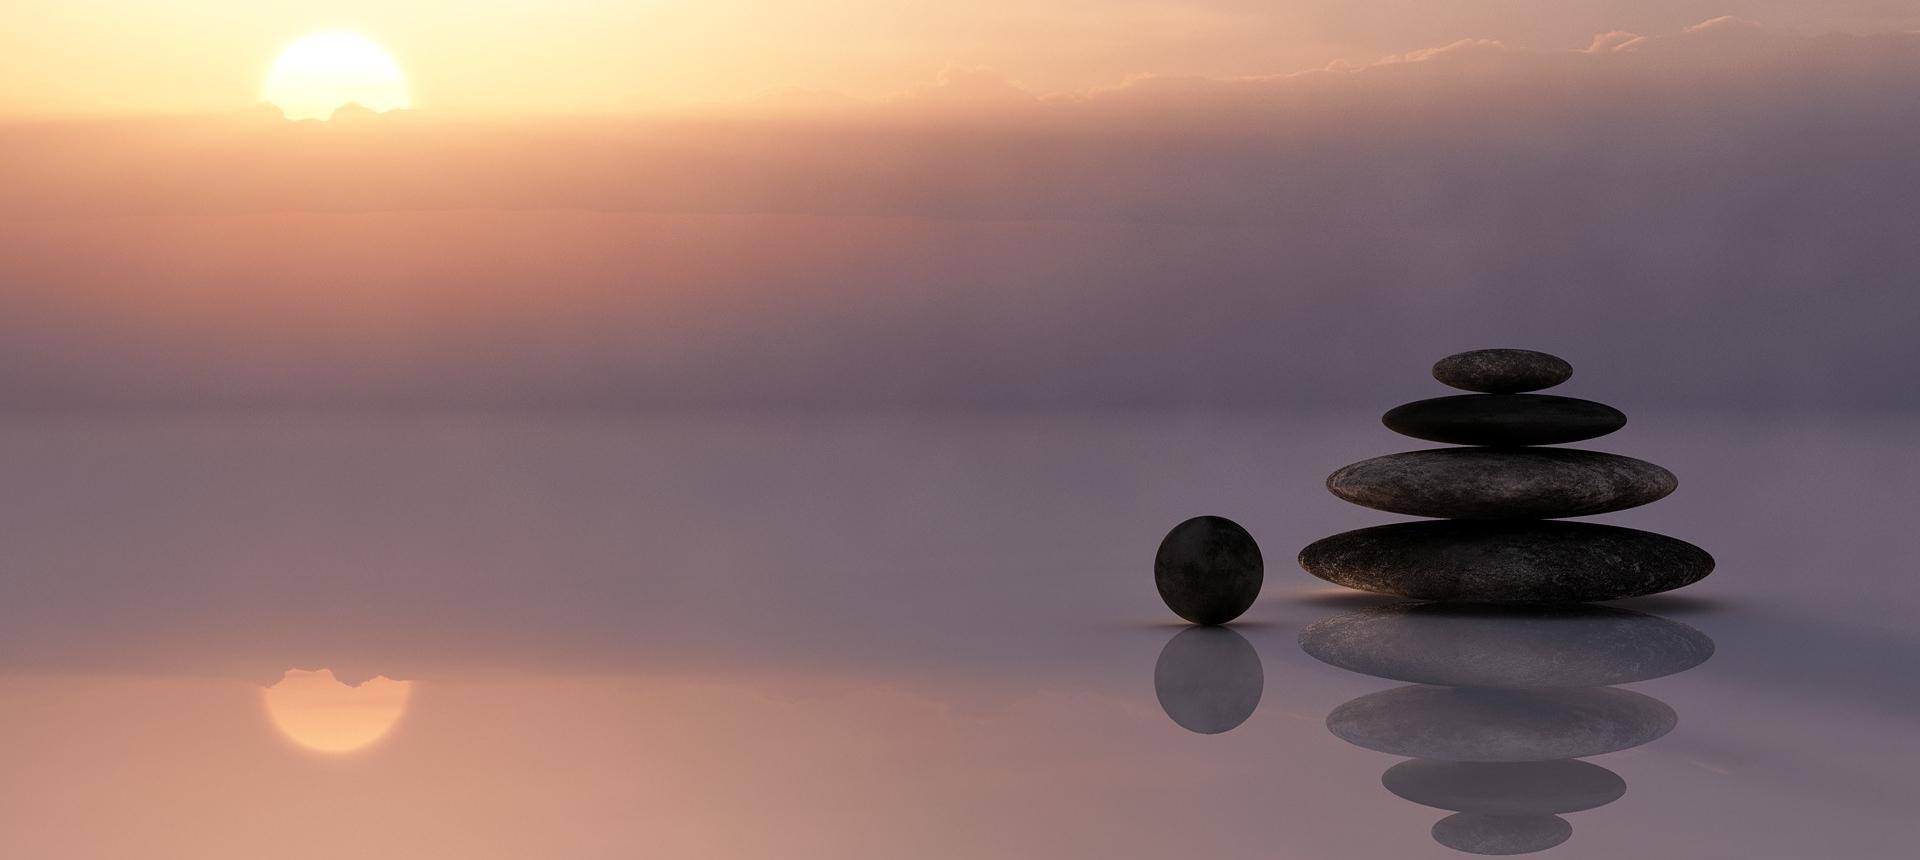 - The Treasure Hunter blog on exploring life through minimalism